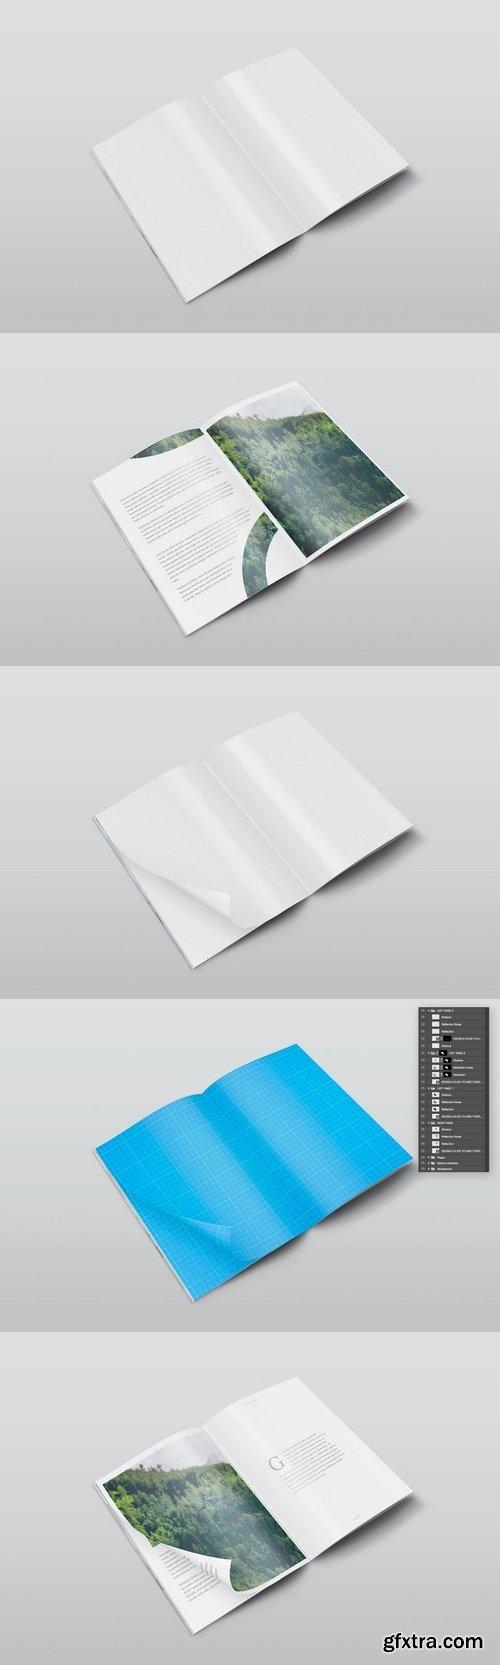 A4 PSD Magazine Mockup Isometric View